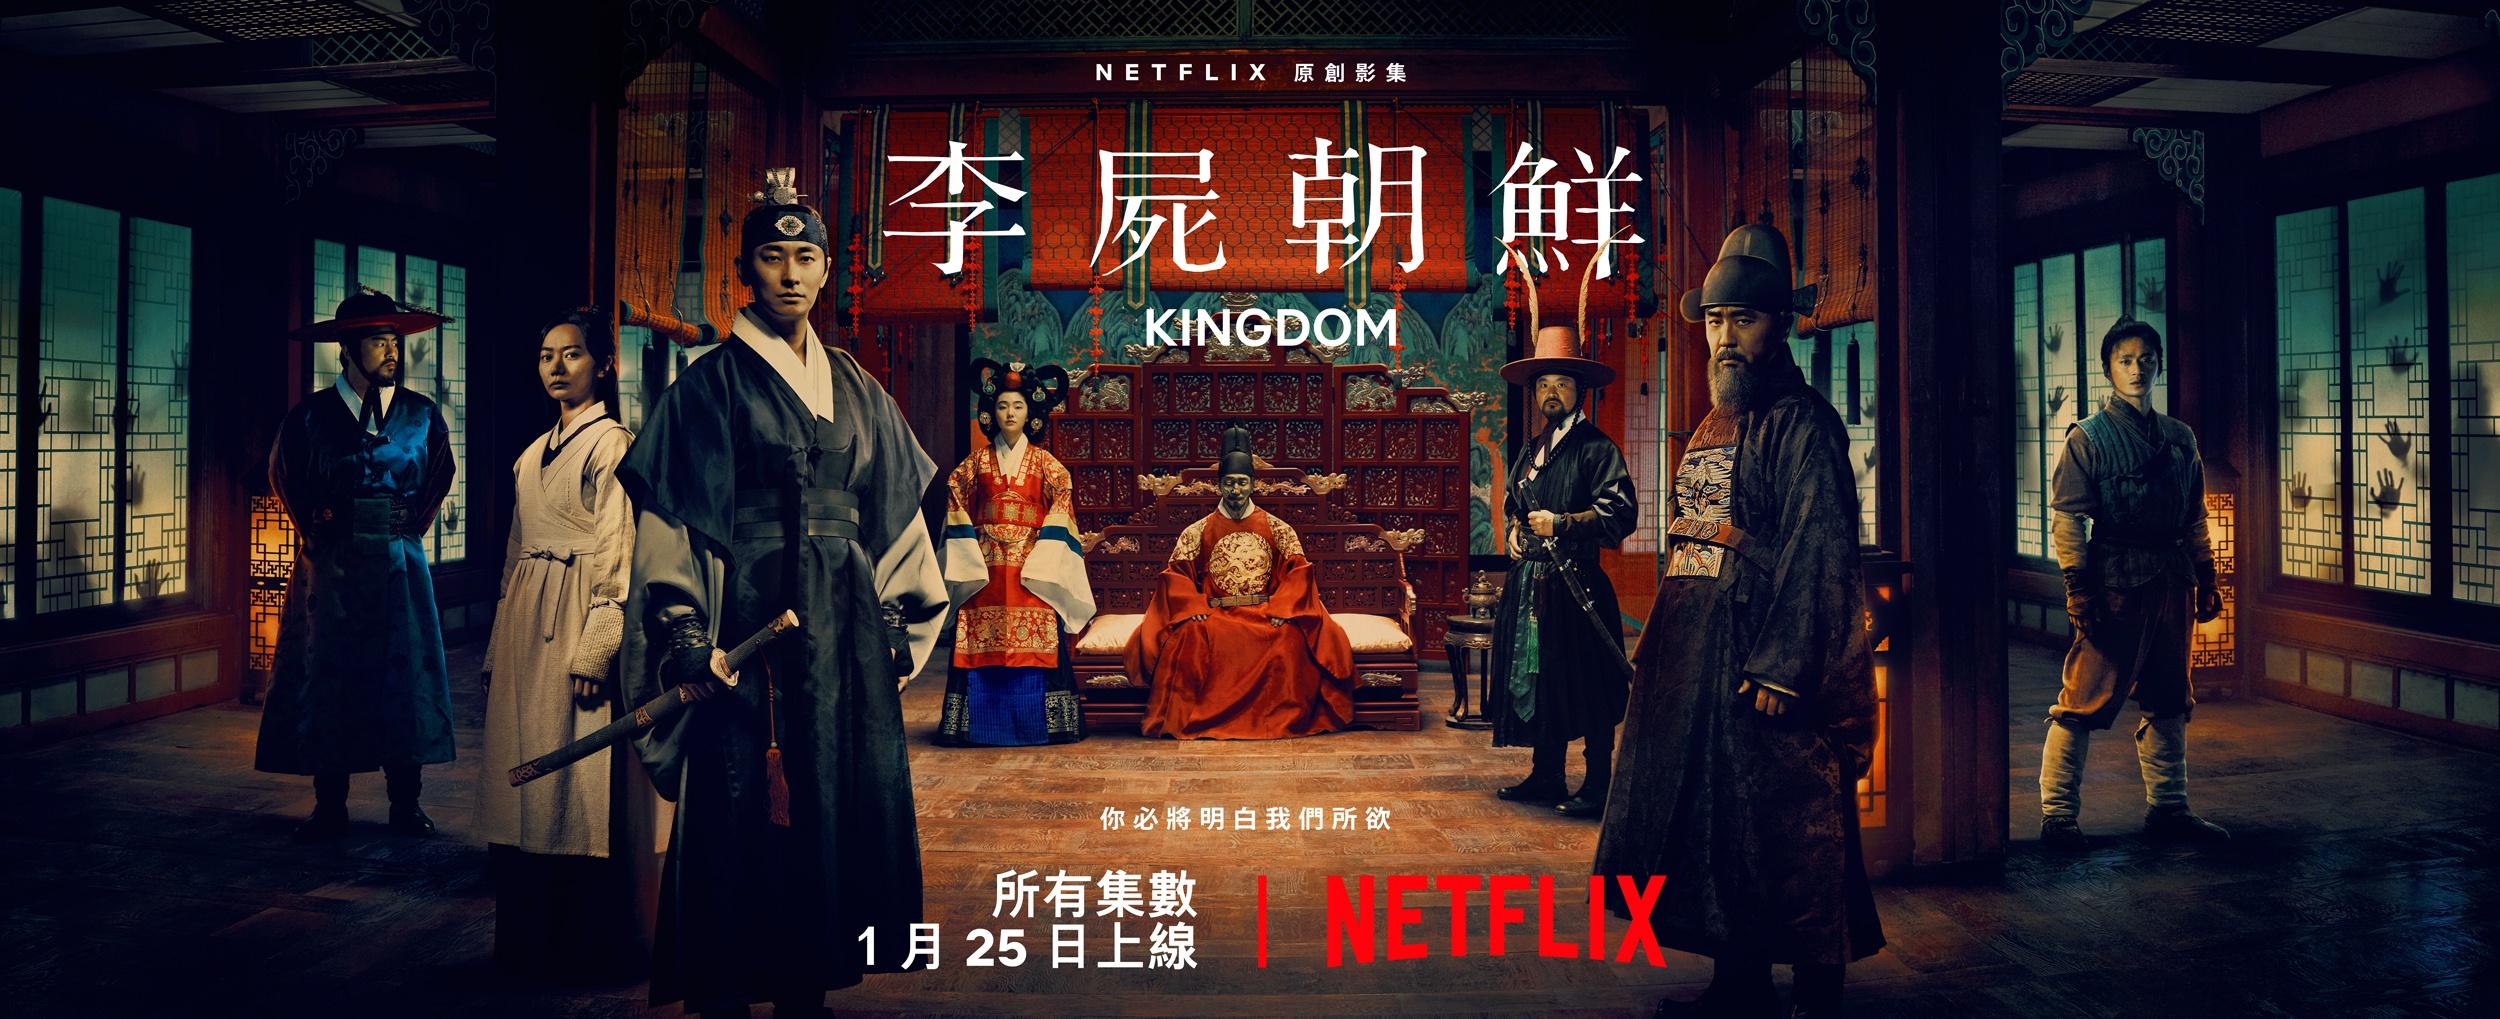 20181219_Kingdom_Poster.jpg